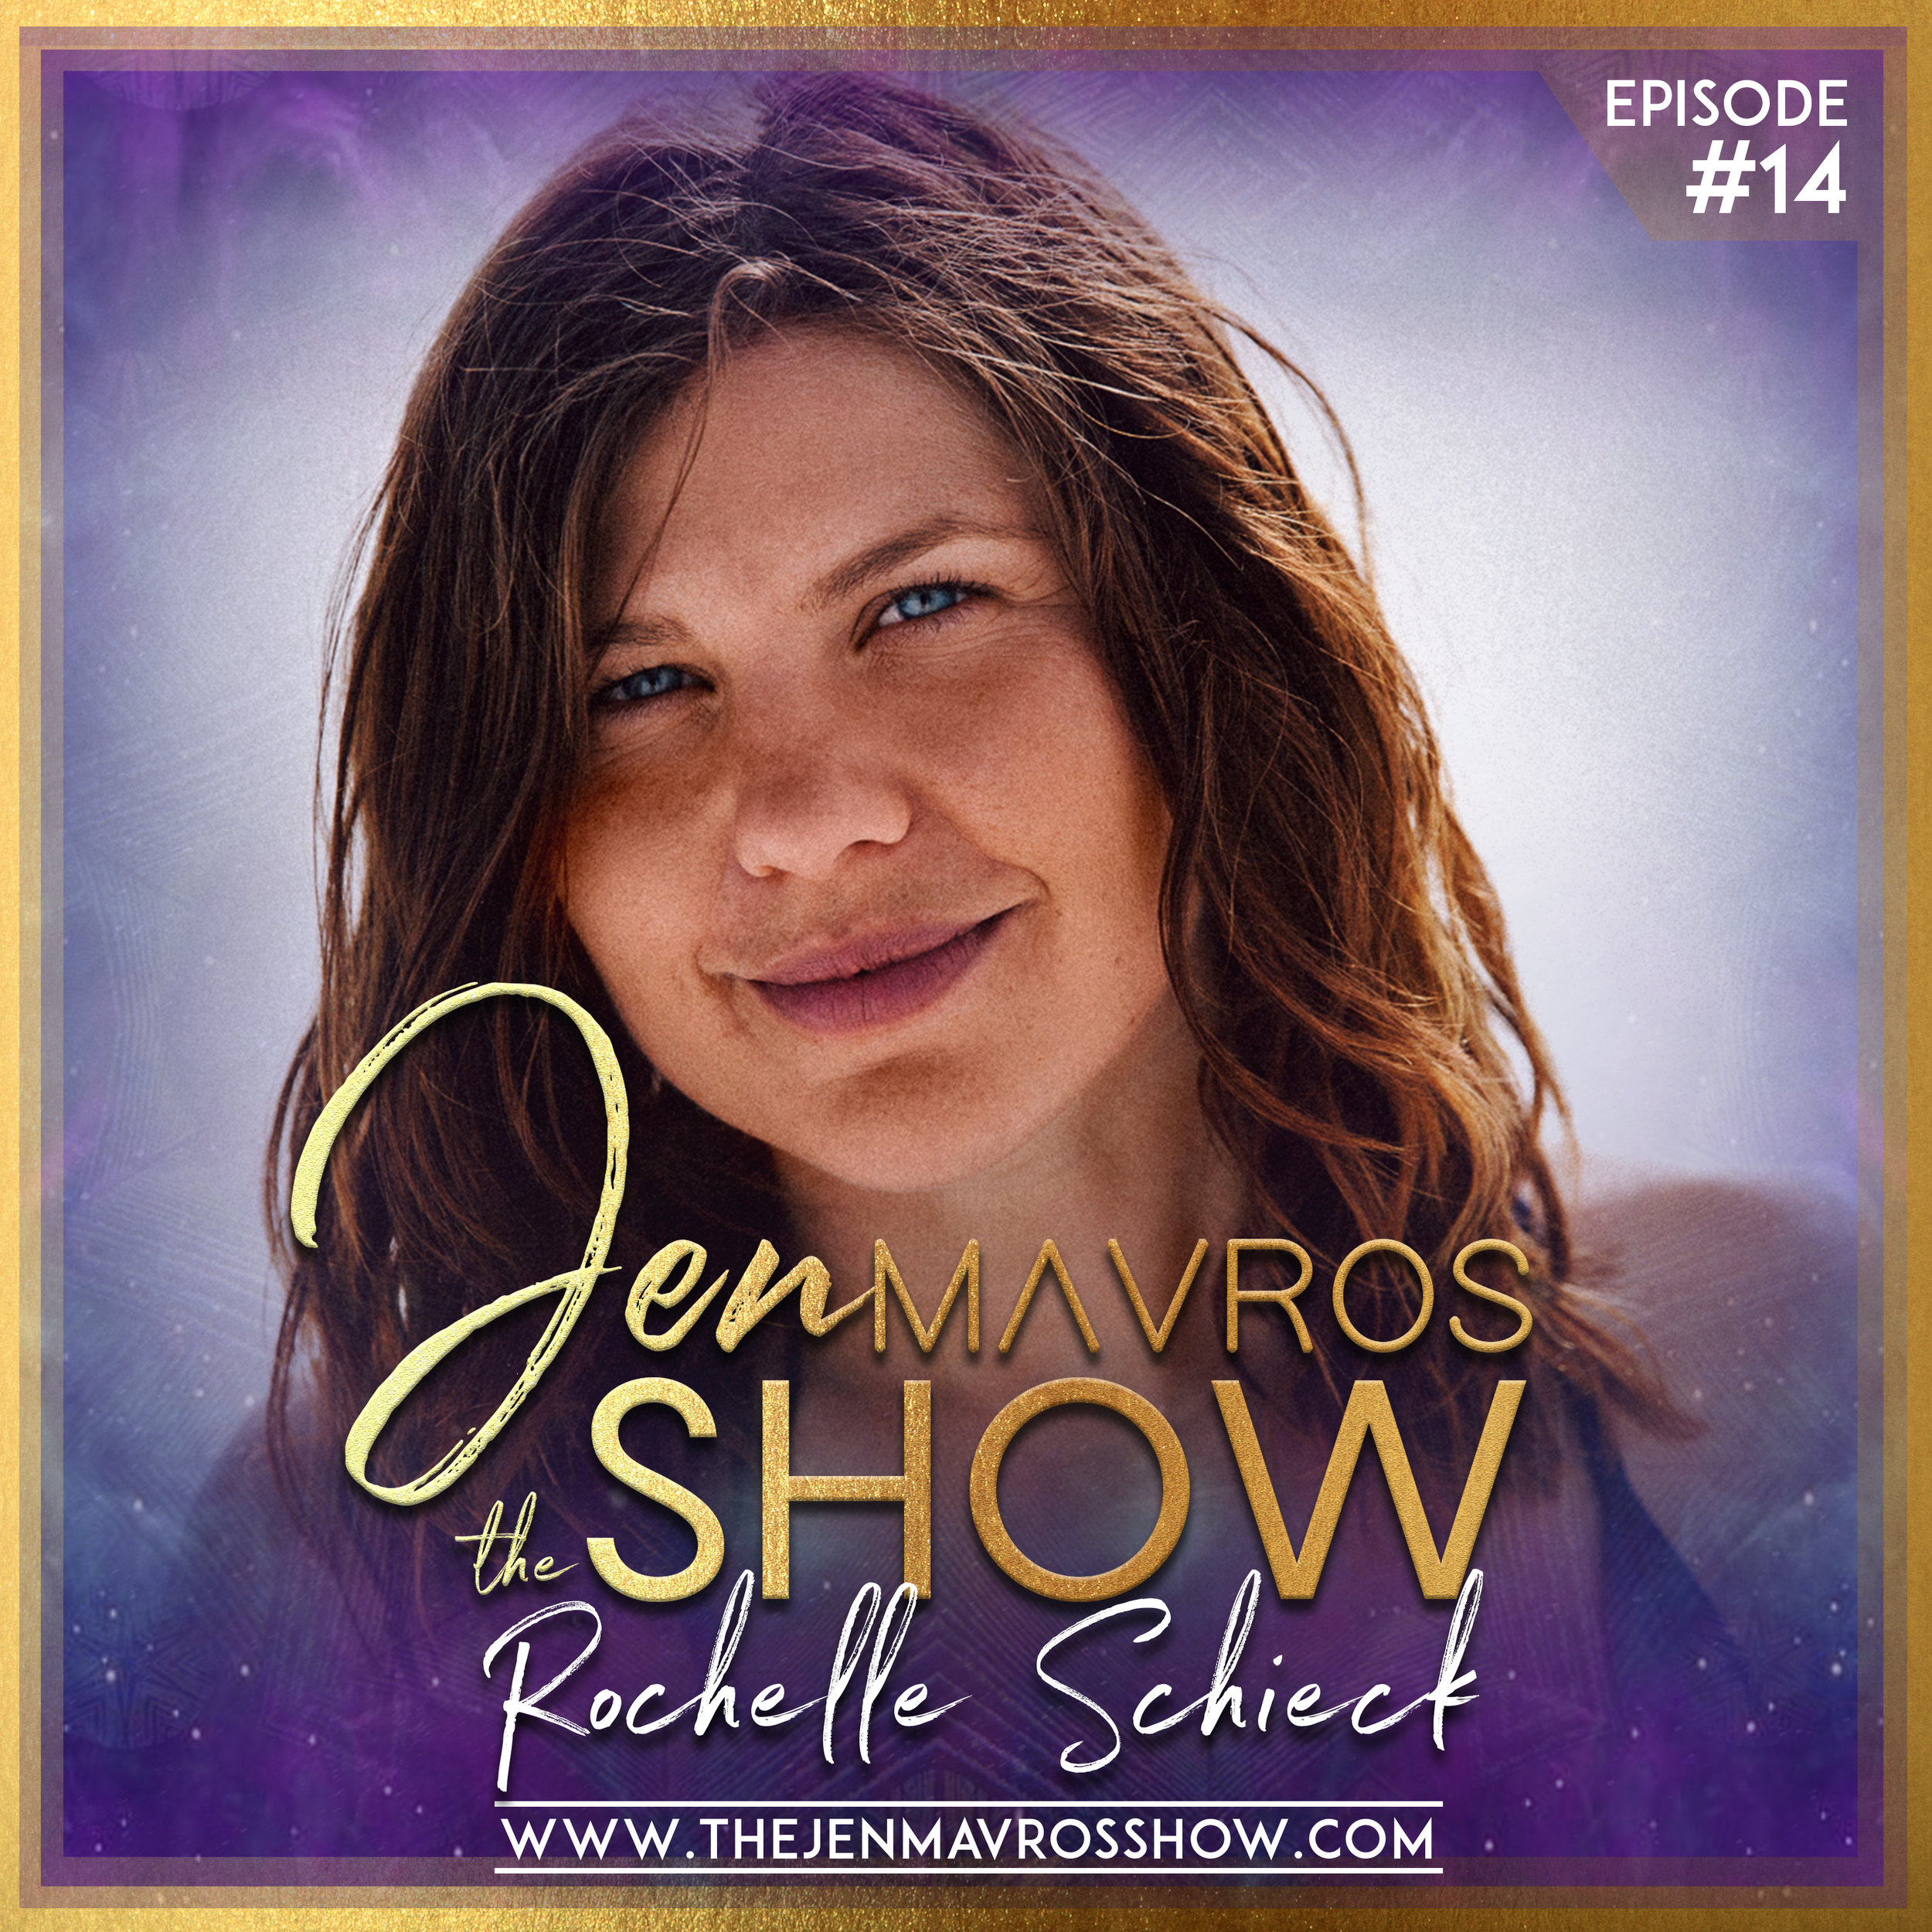 Rochelle Schieck - Through Movement, We Remember - Wise, Wild & Free